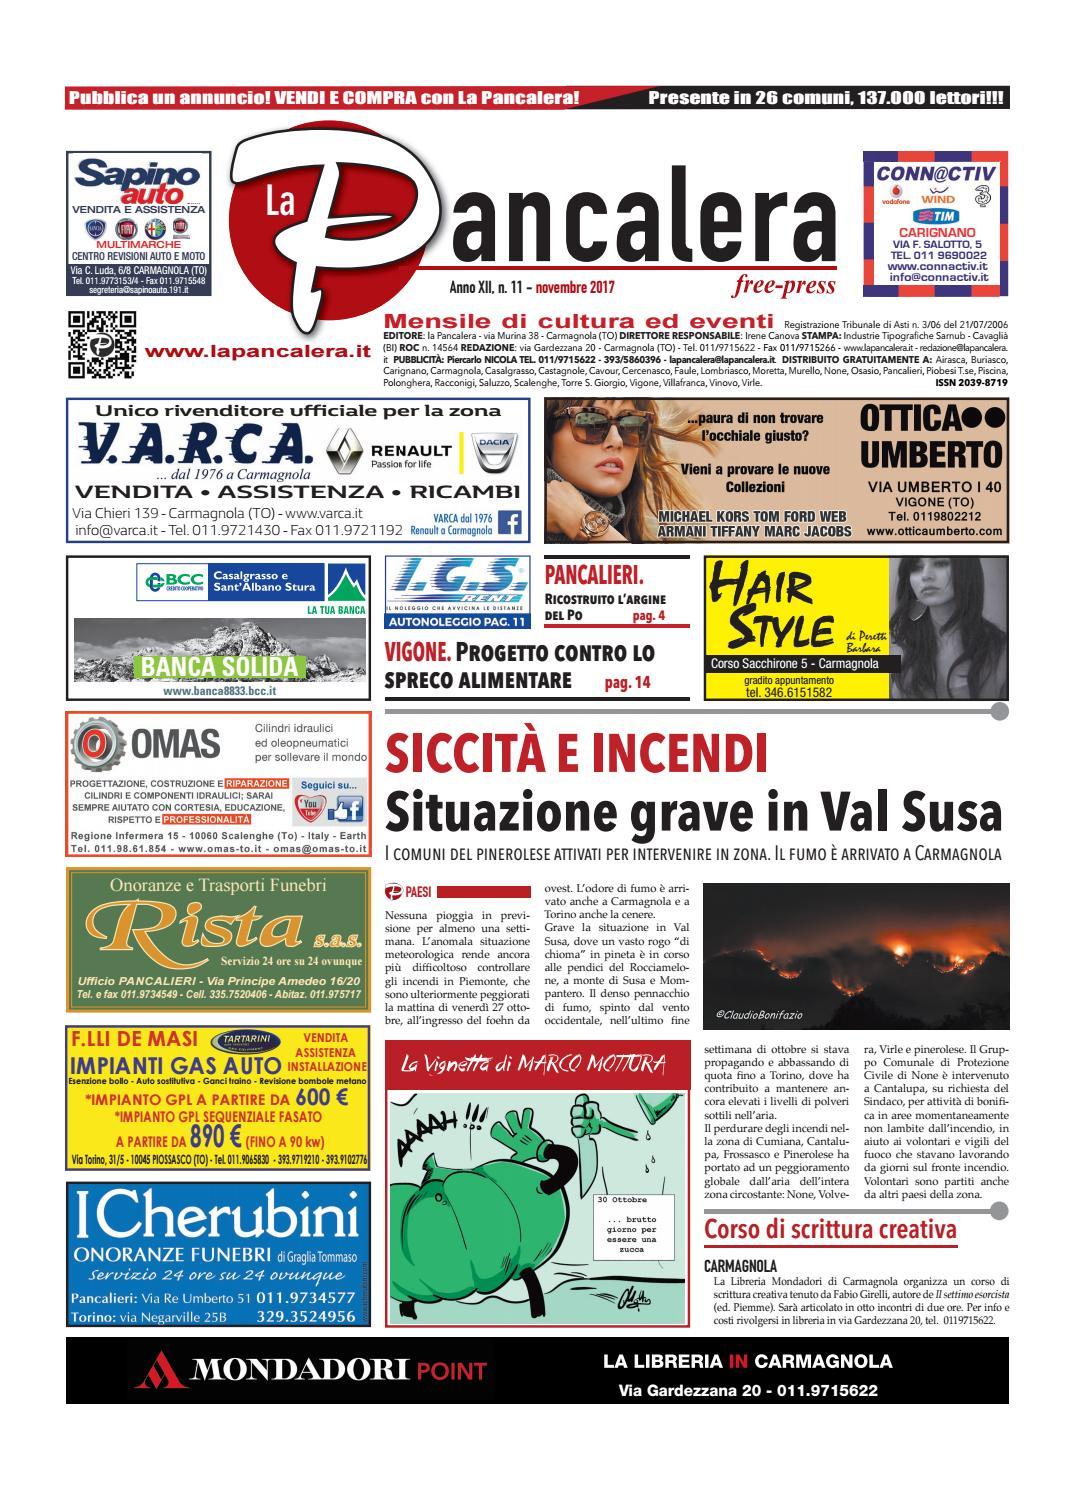 La pancalera novembre 2017 by la Pancalera - issuu df7f796f24b